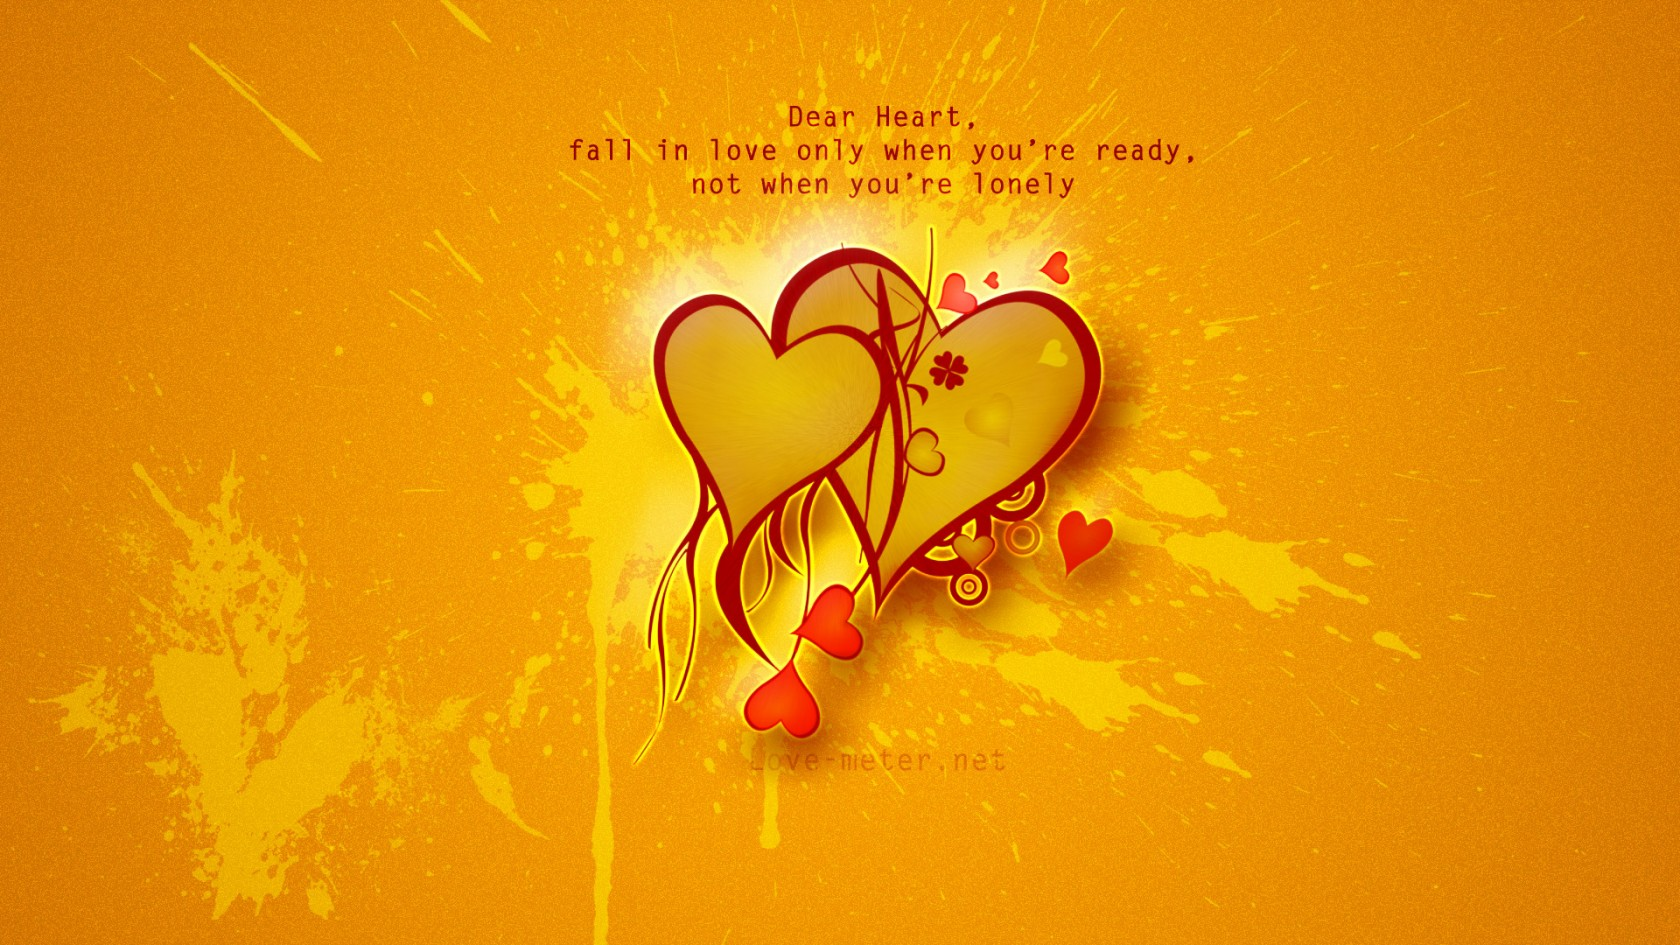 Love Quotes Wallpaper 3 High Resolution Wallpaper Hdlovewall Com